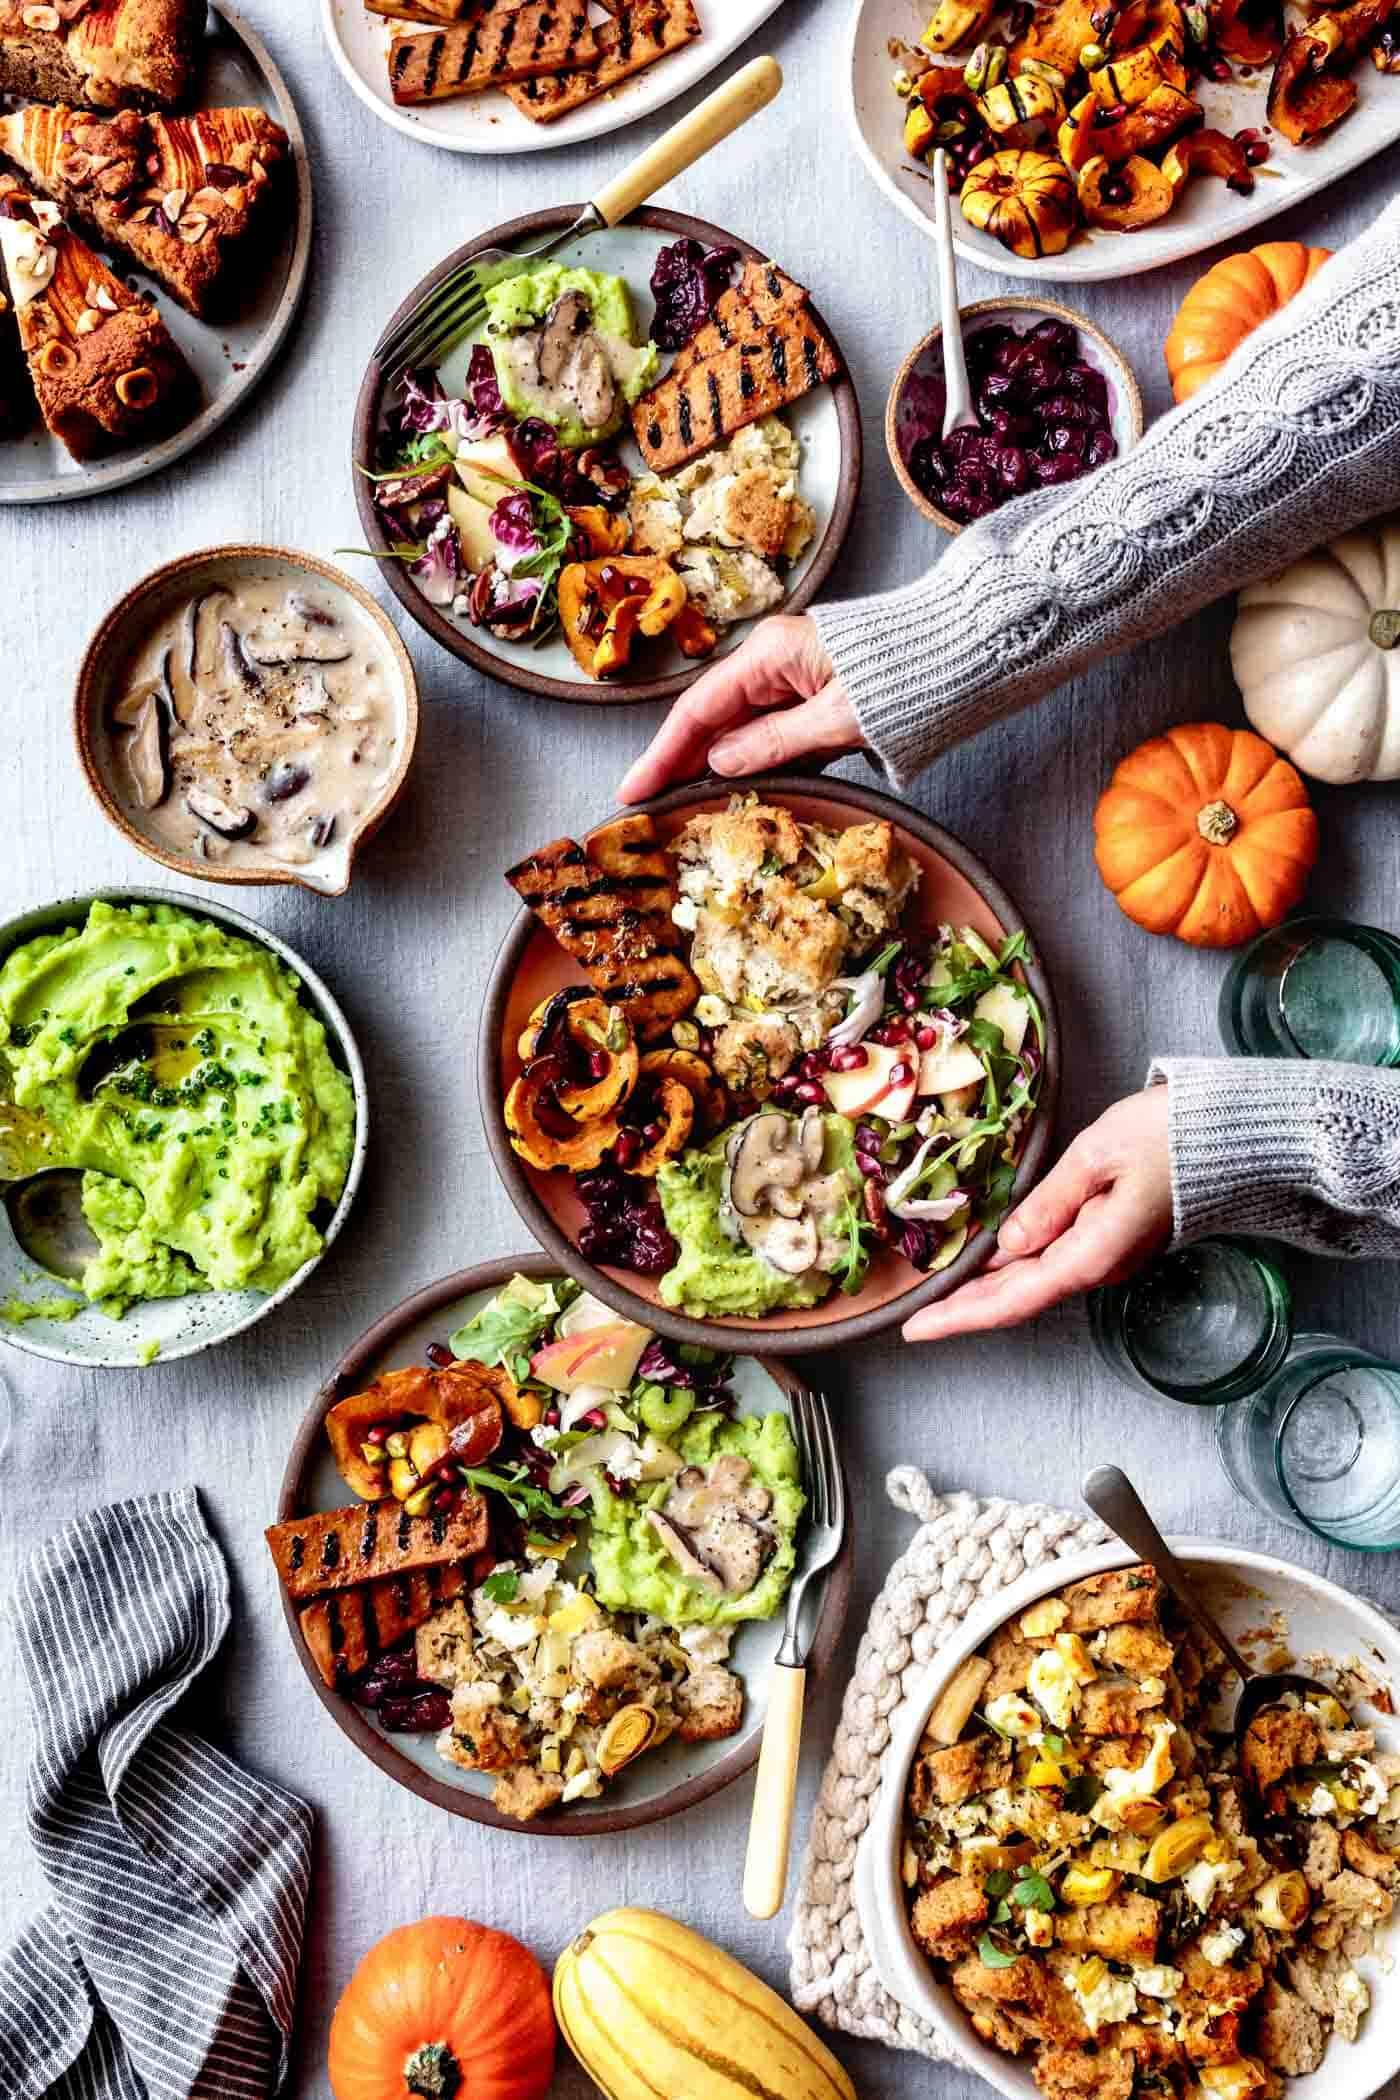 Plates of vegetarian gluten-free Thanksgiving dinner